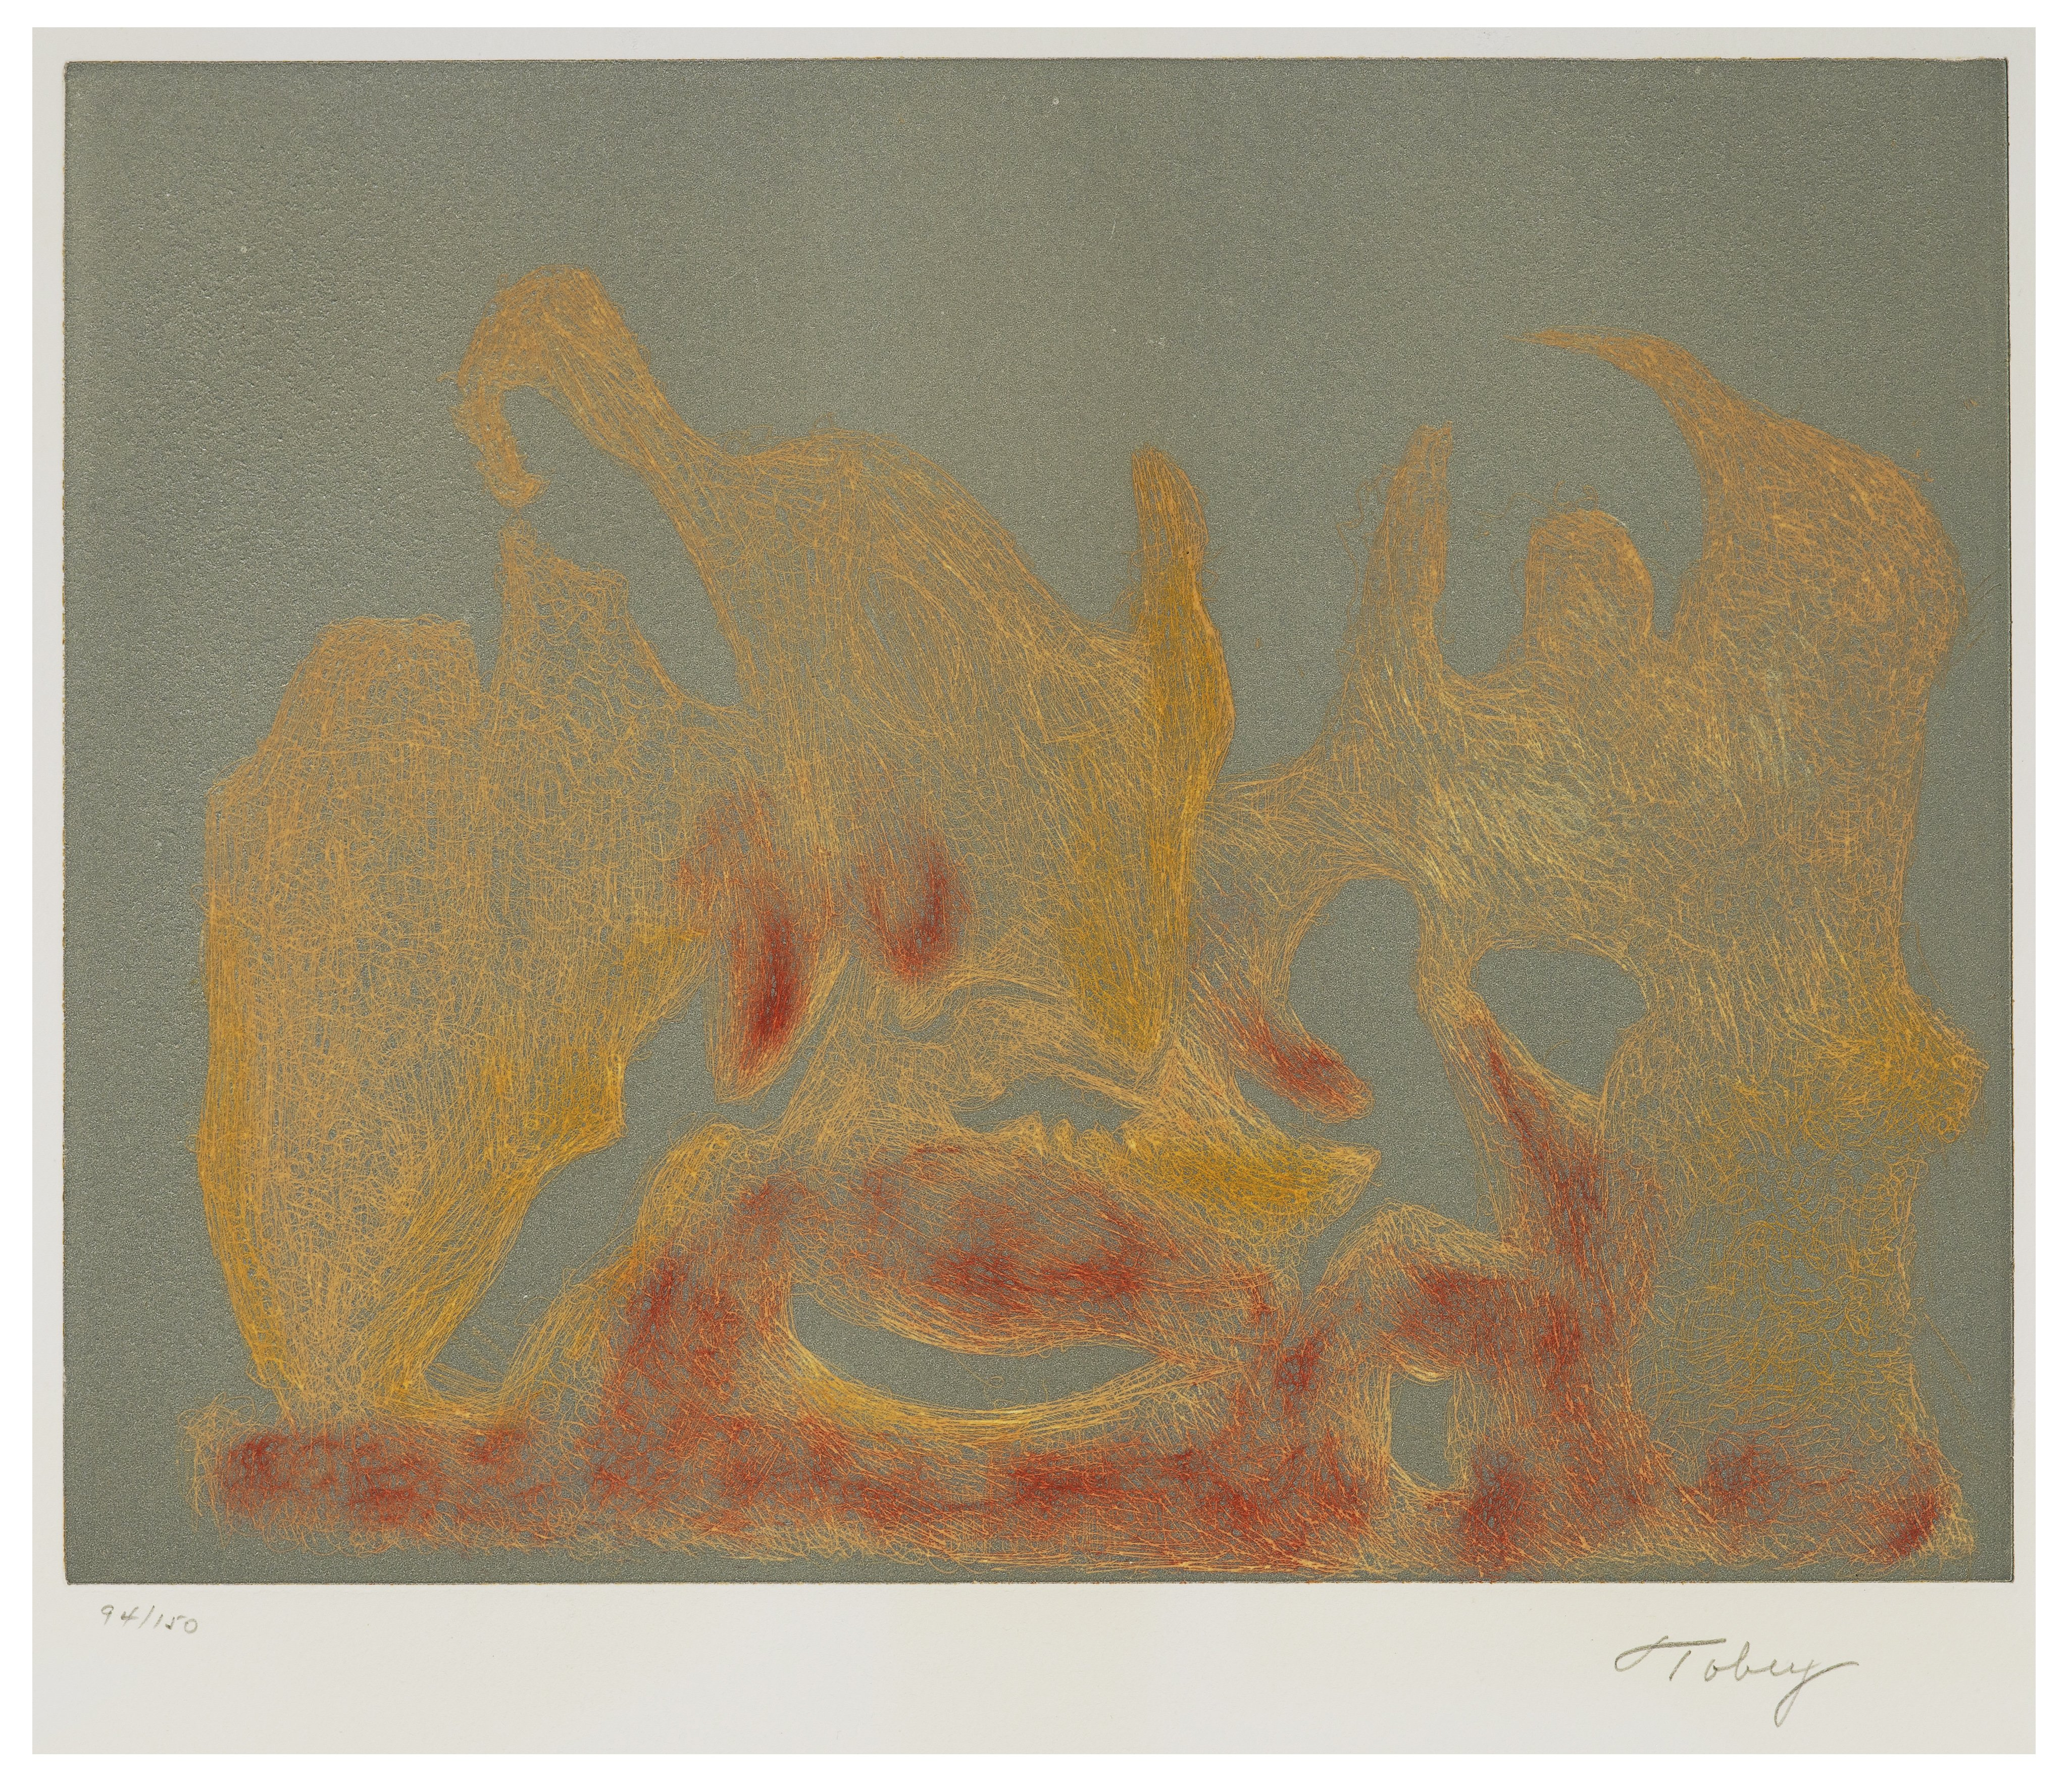 A Vintage Expressionist 1974 Mark Tobey Signed Intaglio Print Awakening Dawn